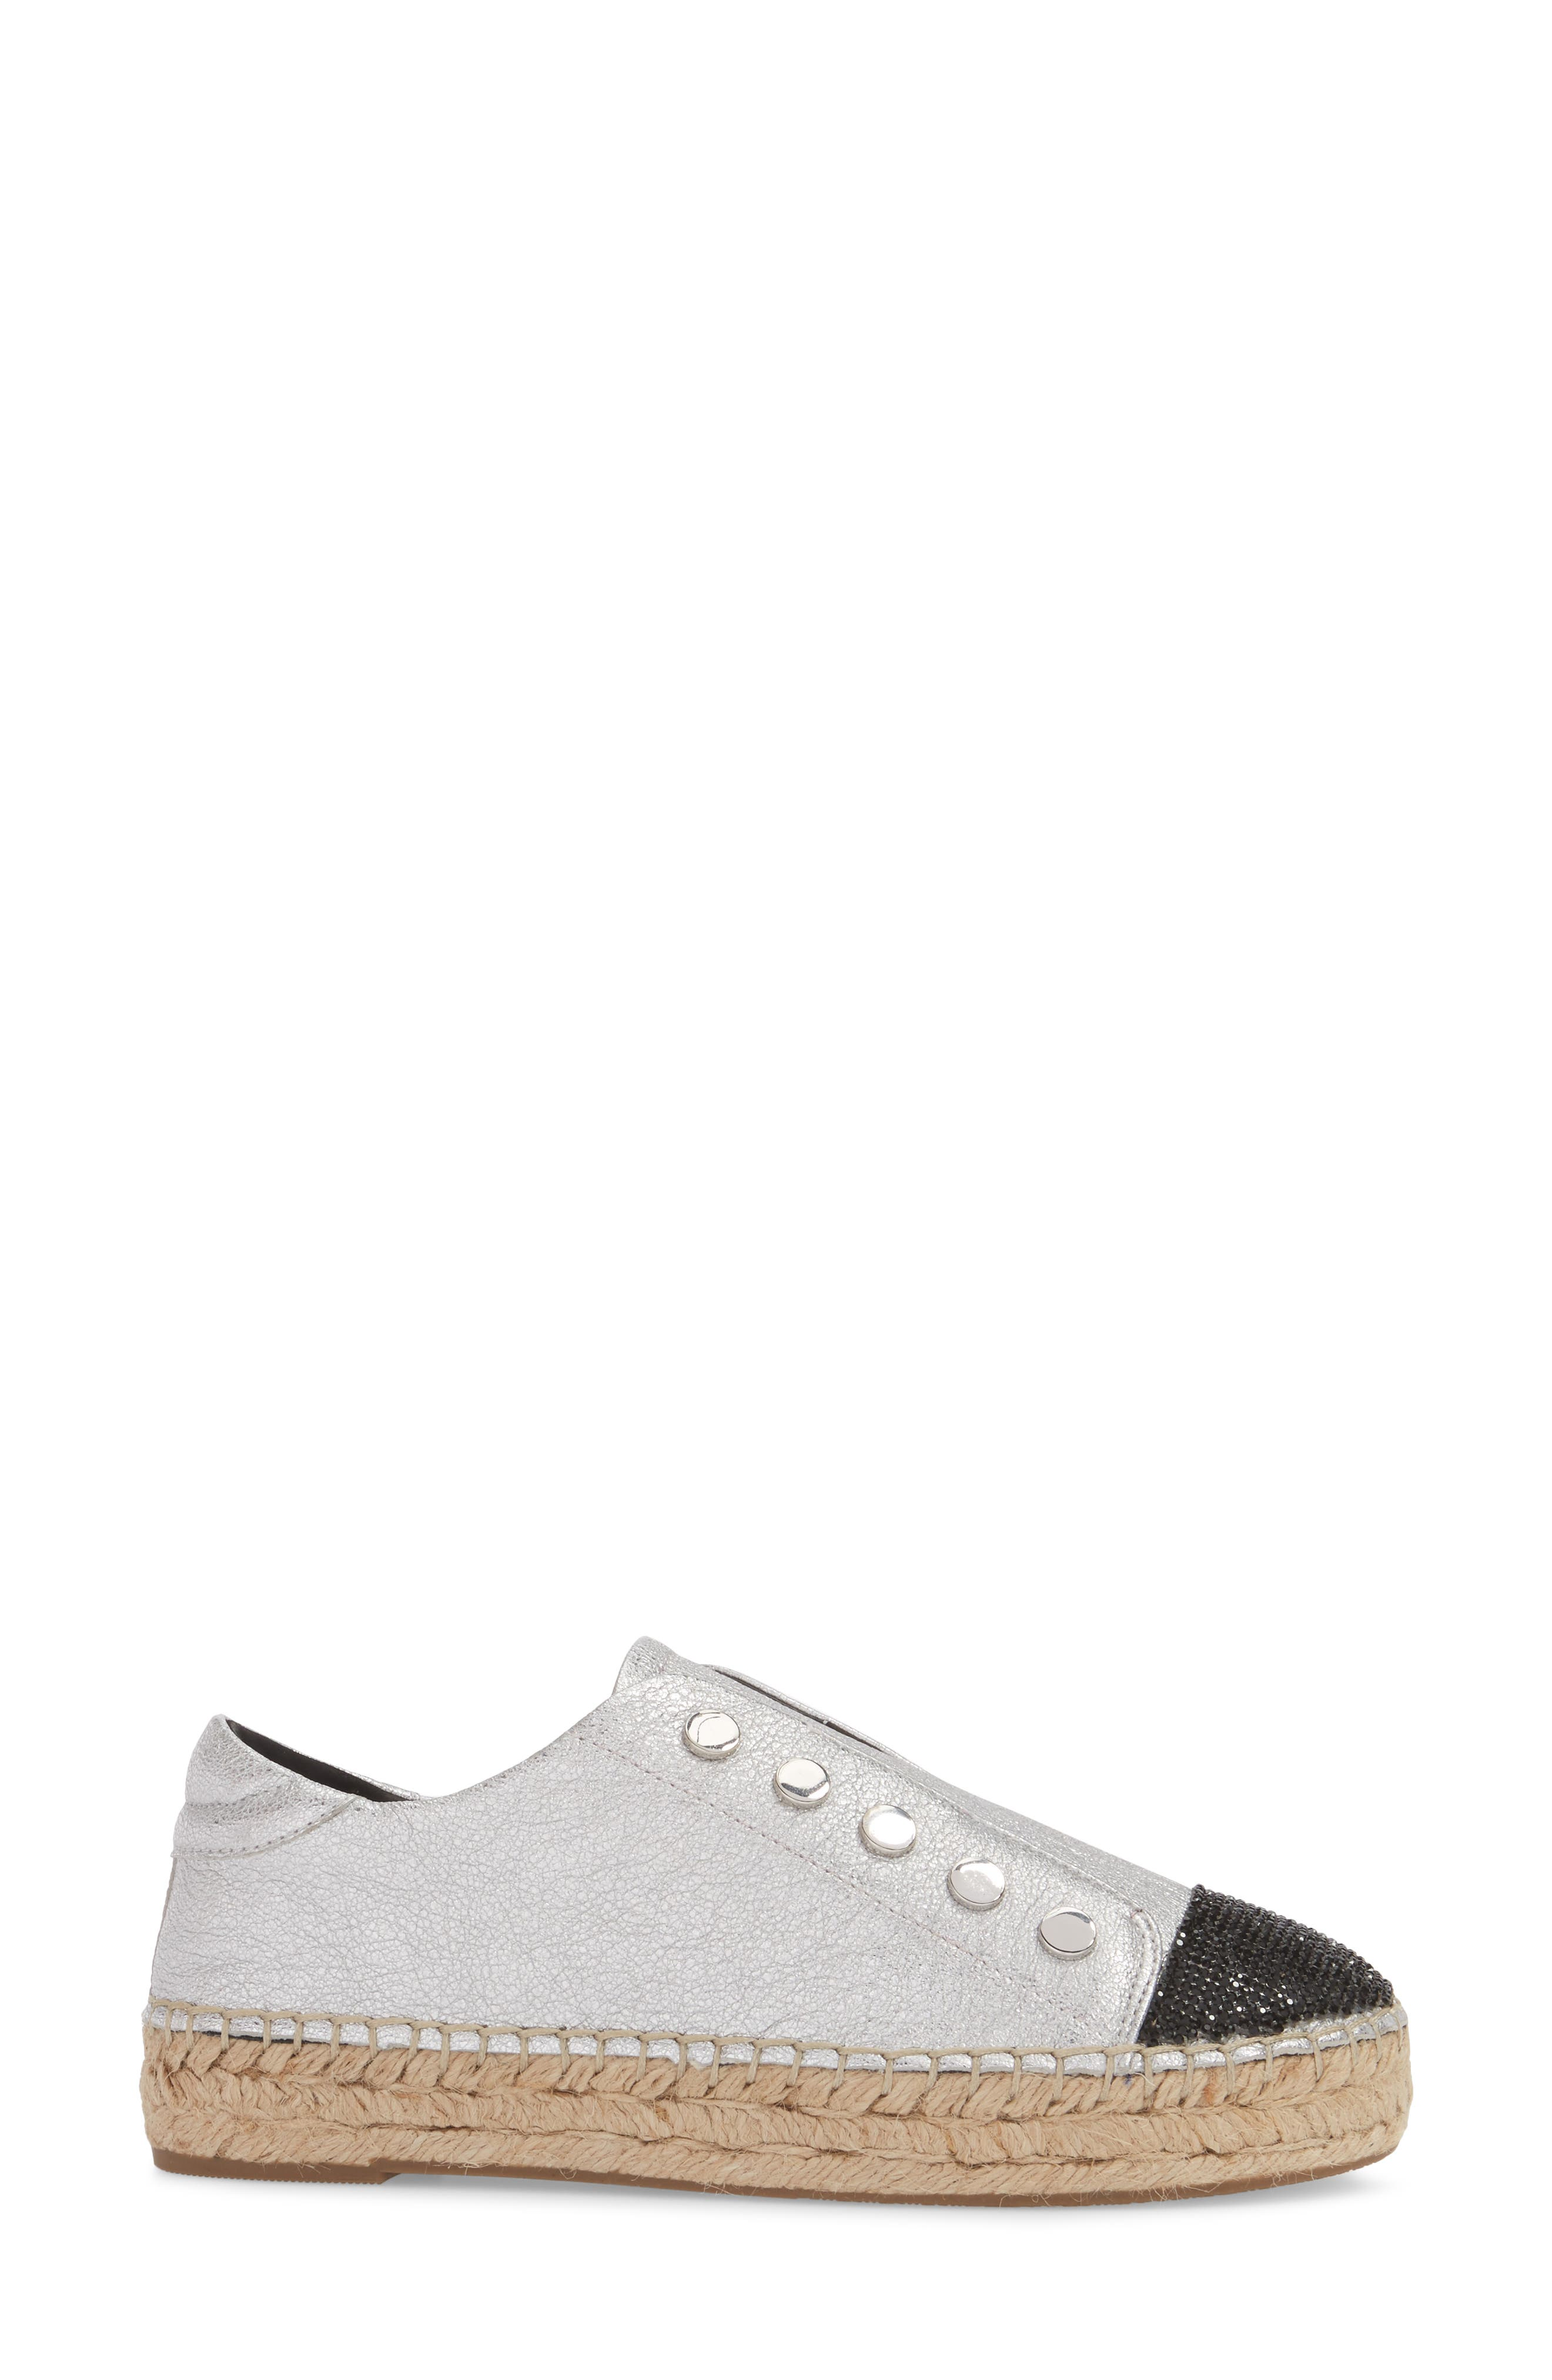 Juniper Espadrille Sneaker,                             Alternate thumbnail 3, color,                             SILVER